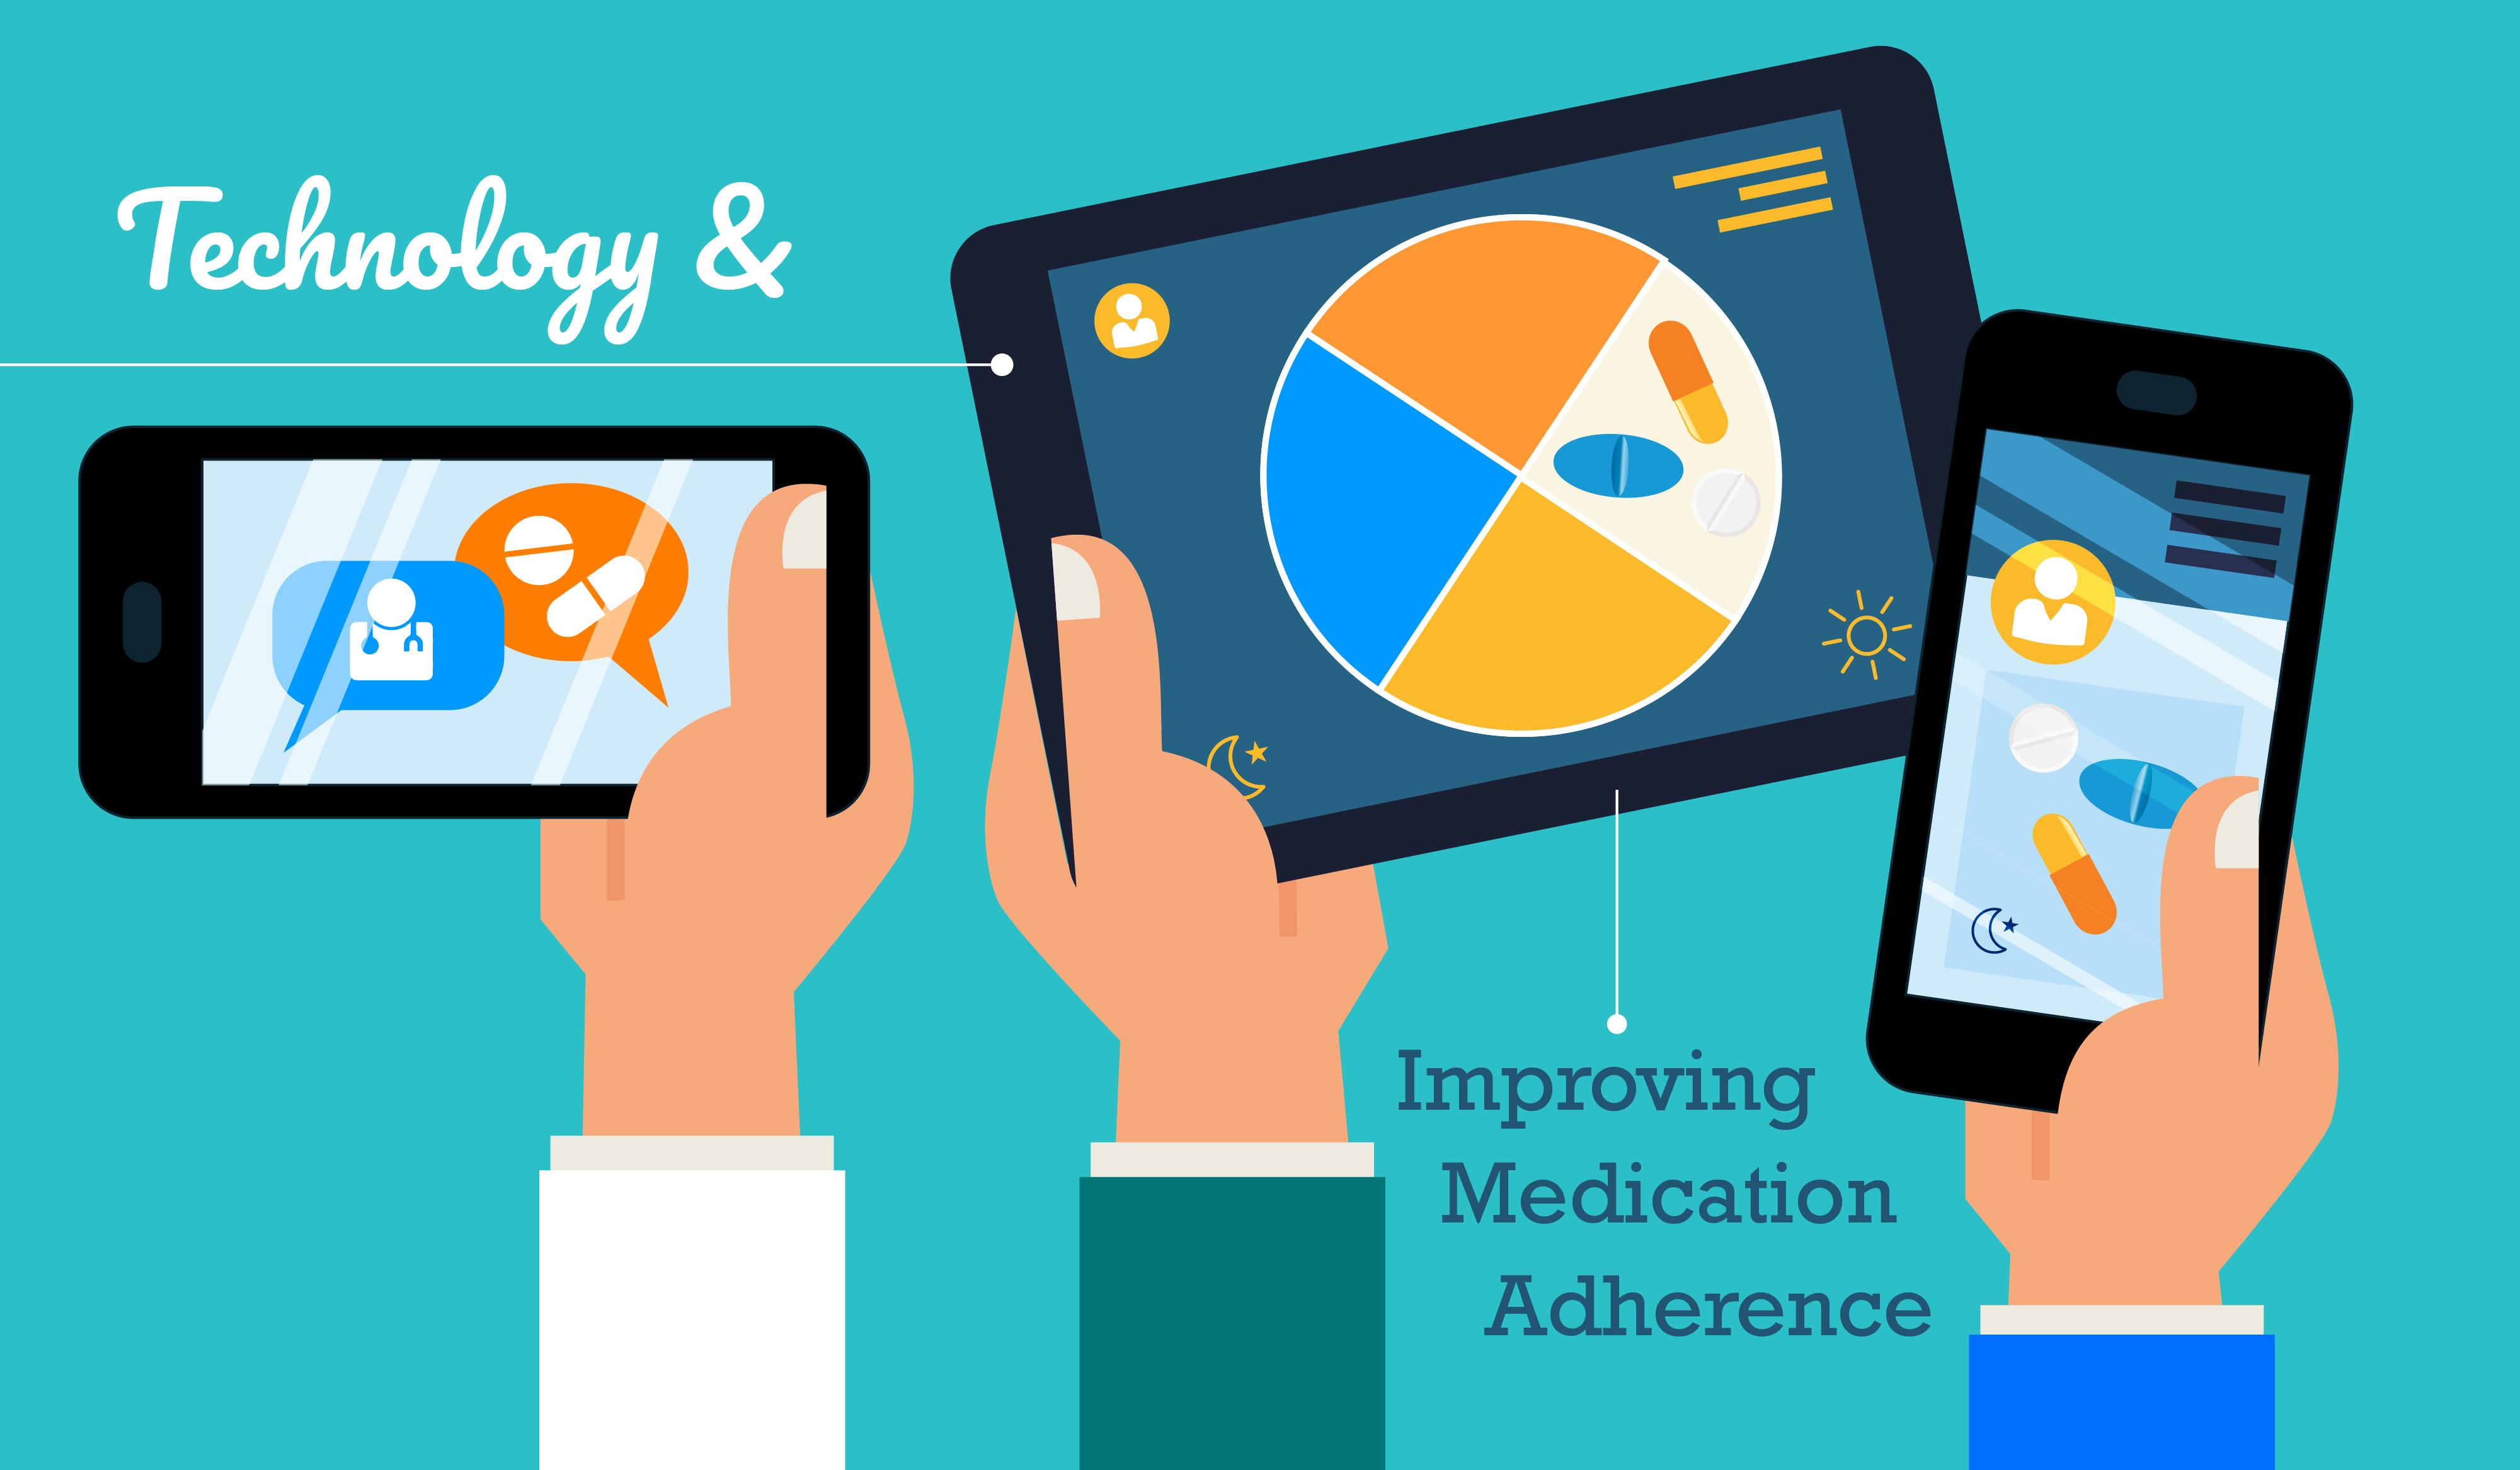 Technology Evolves to Improve Medication Adherence blog-01